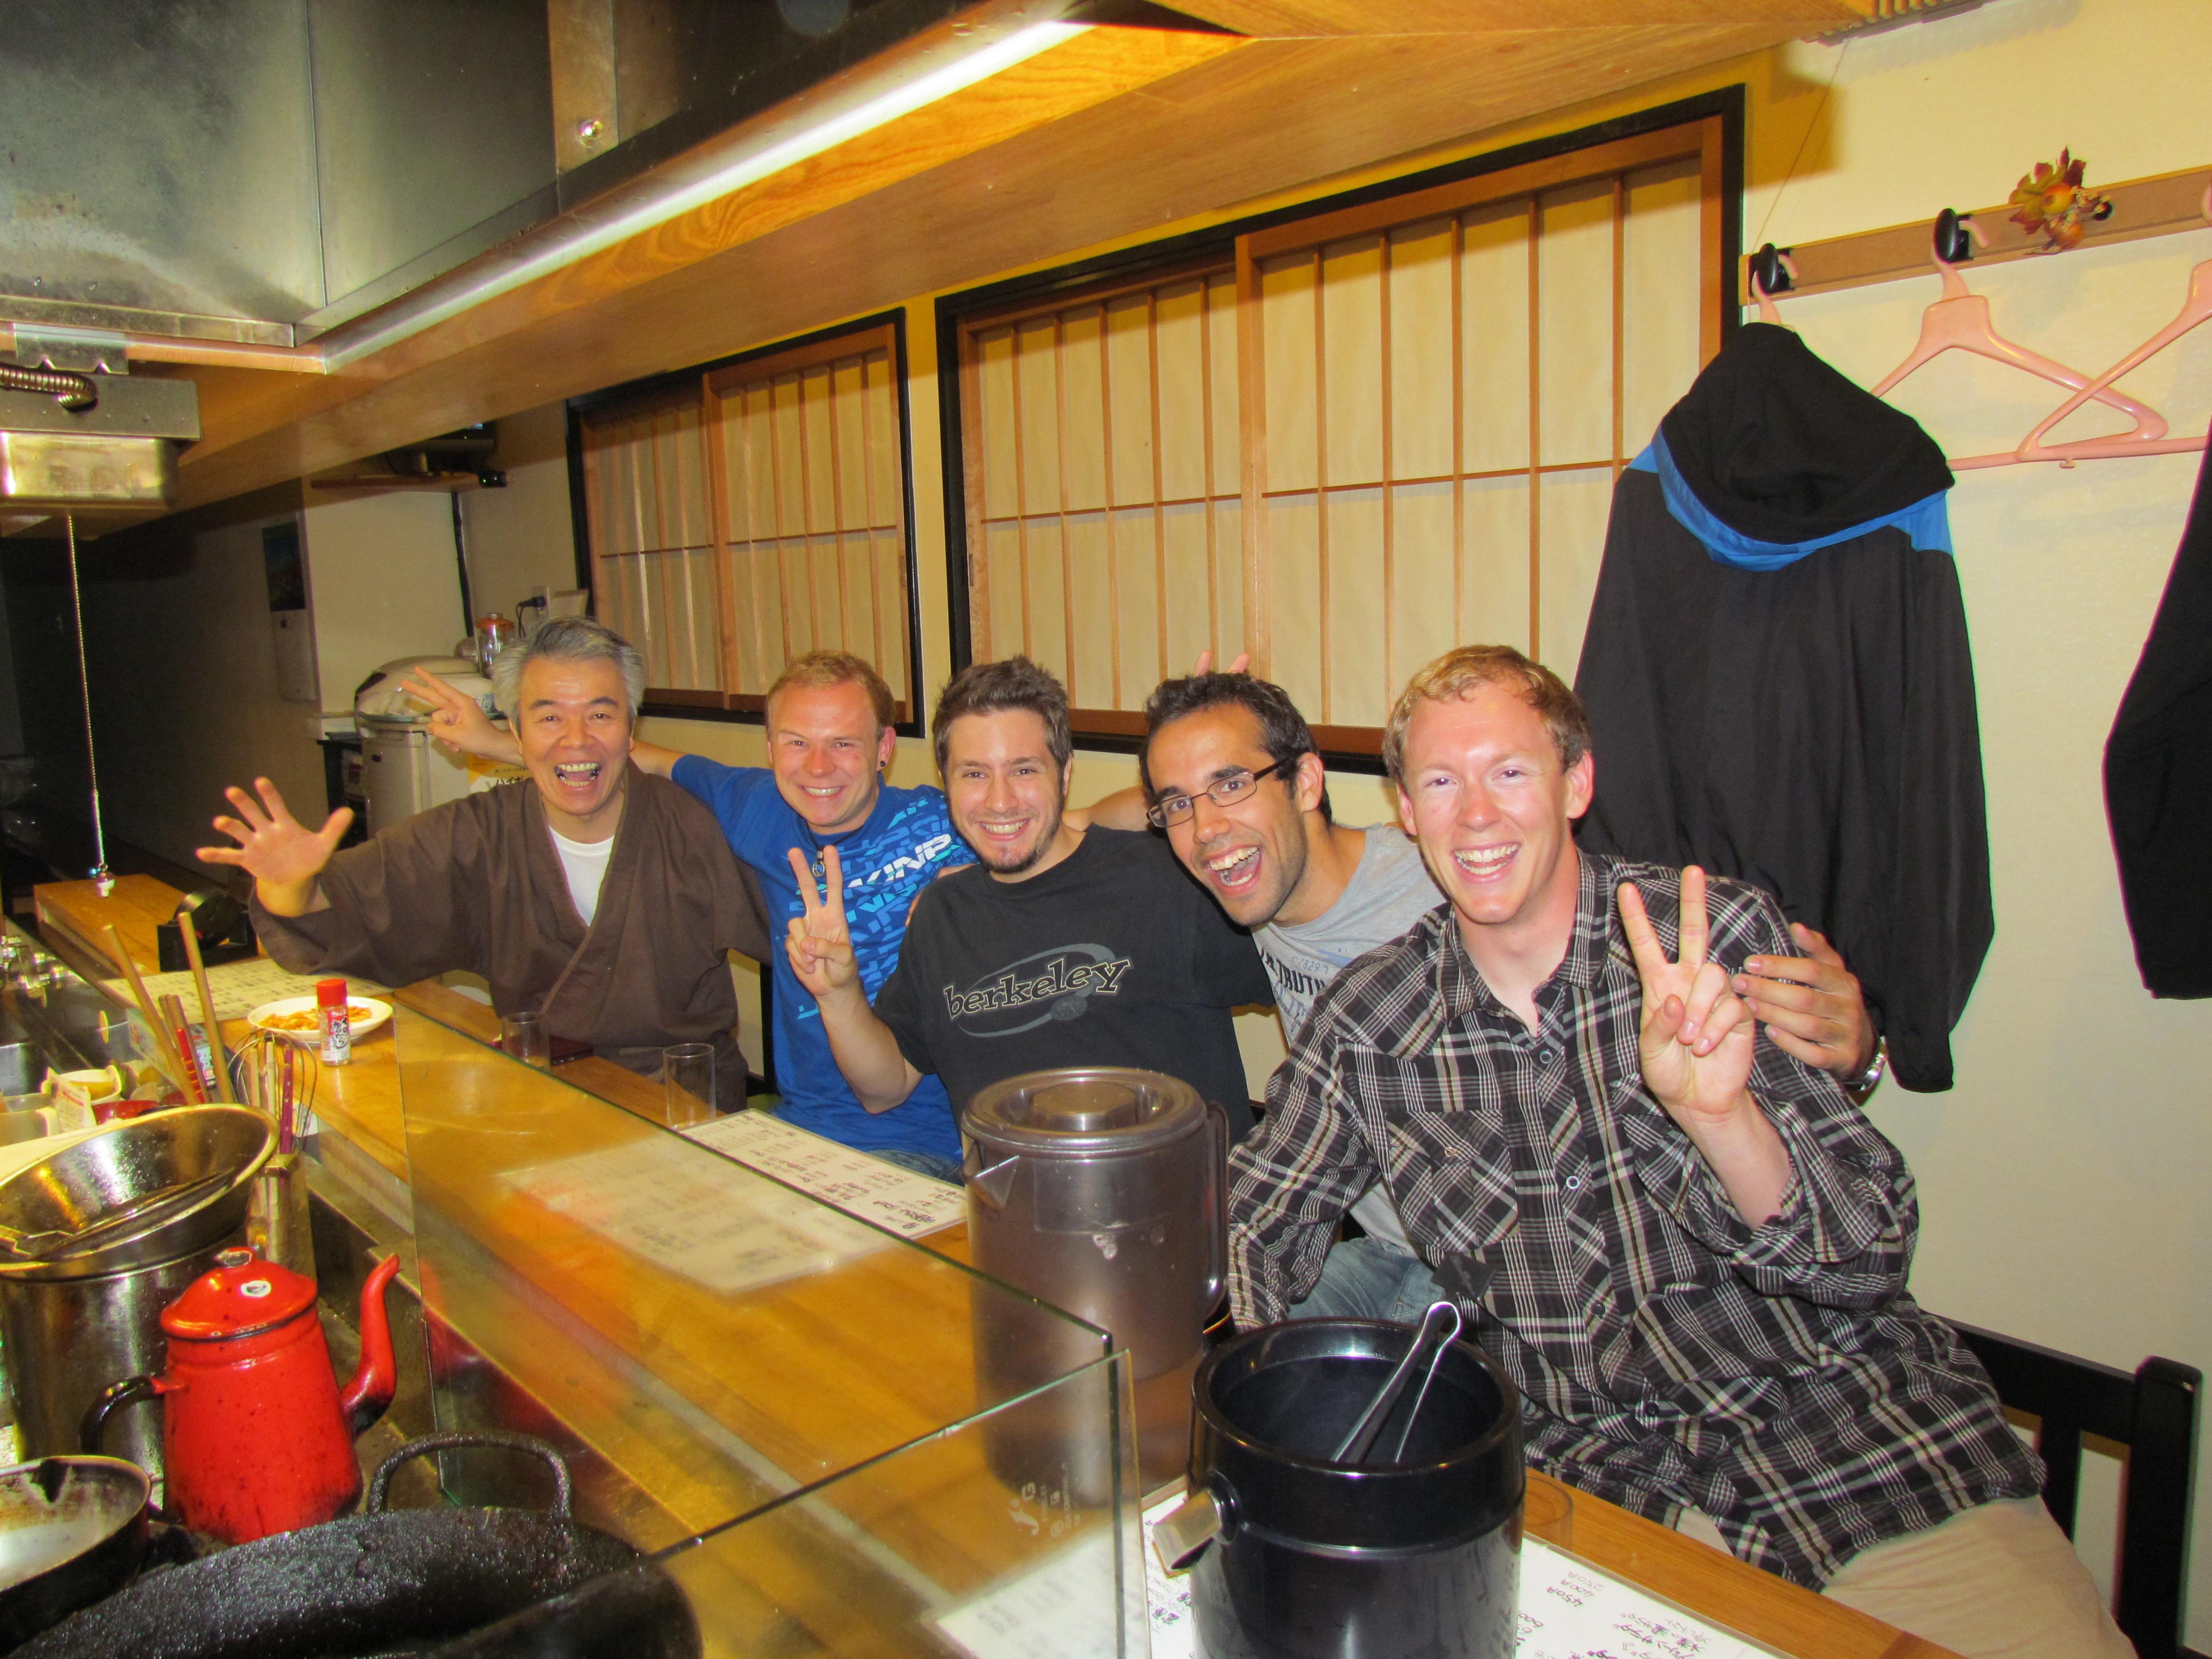 Owner, Florian, Mike, Stefan, Me, at Tomiya